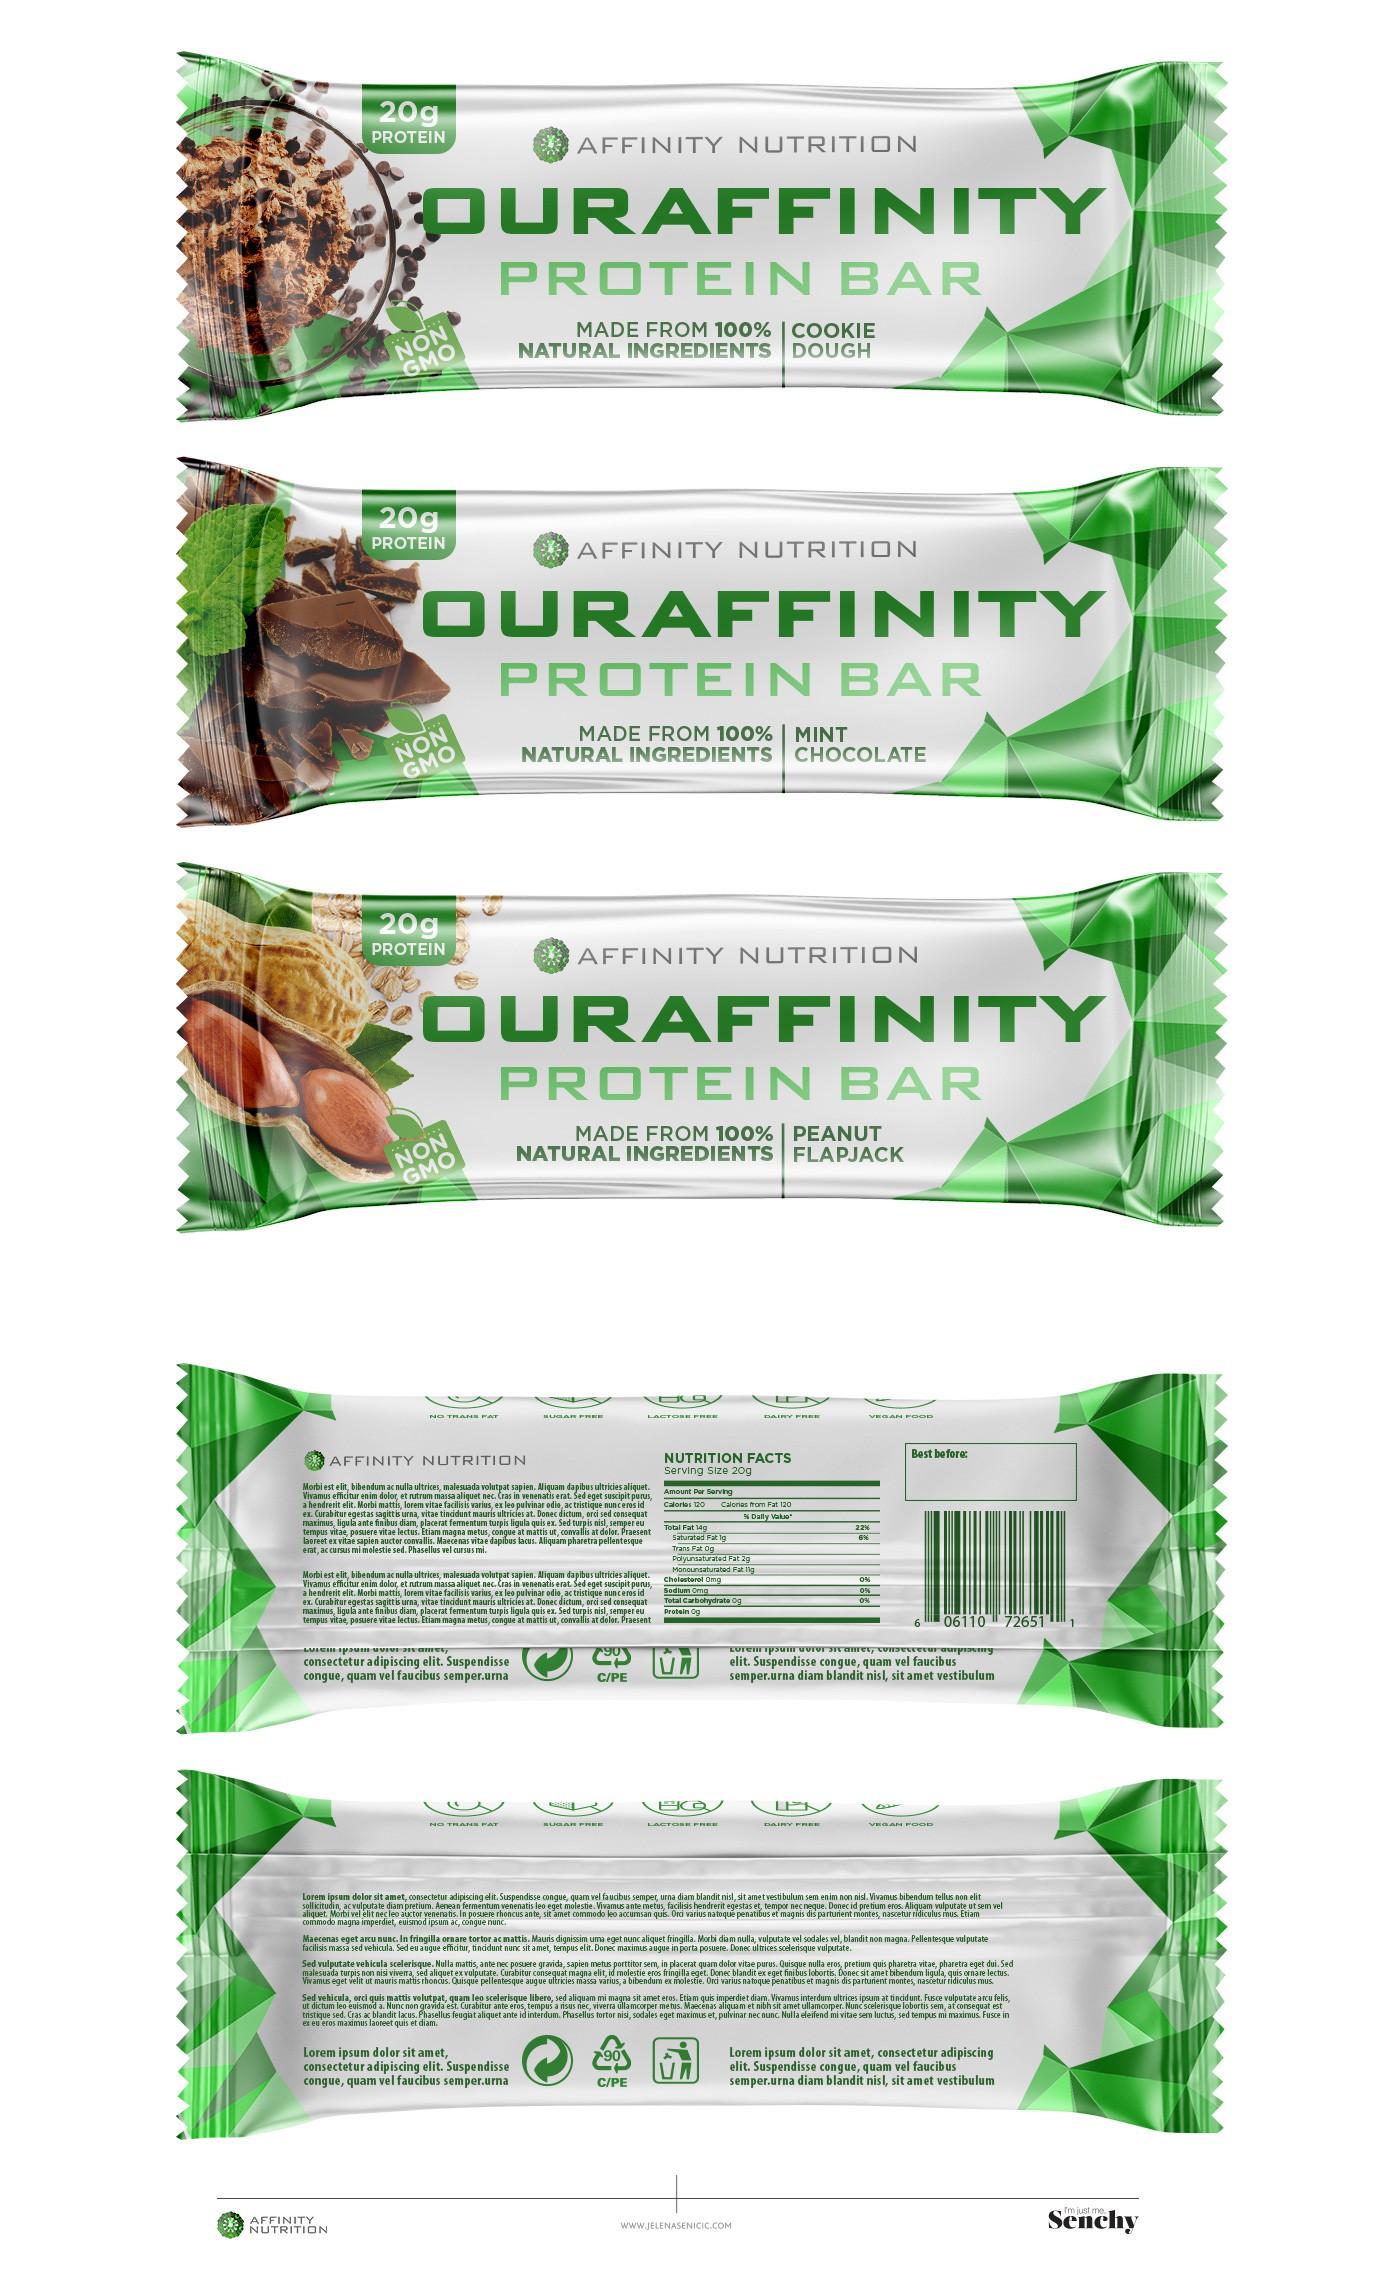 Premium Nutrition Brand Packaging Designs